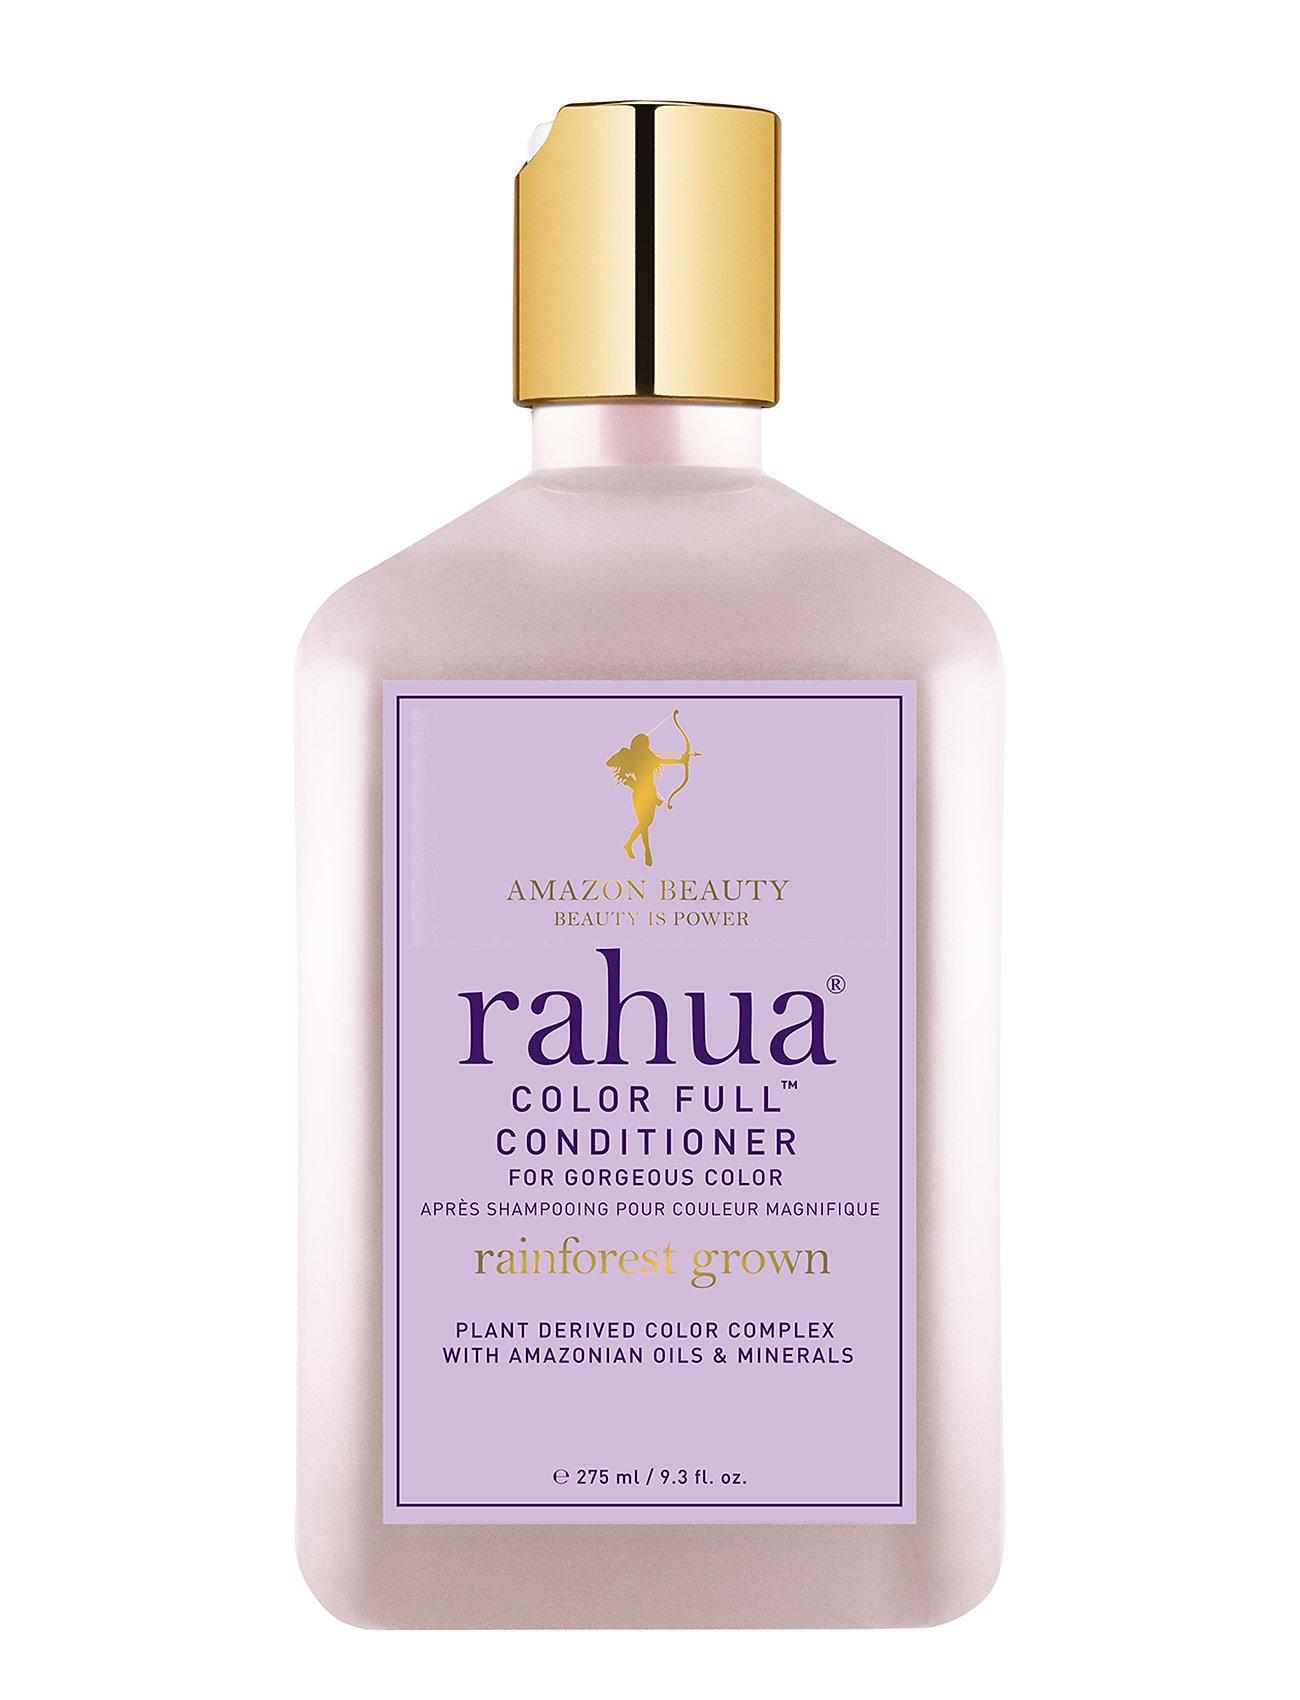 Rahua Rahua Color Full™ Conditioner - CLEAR